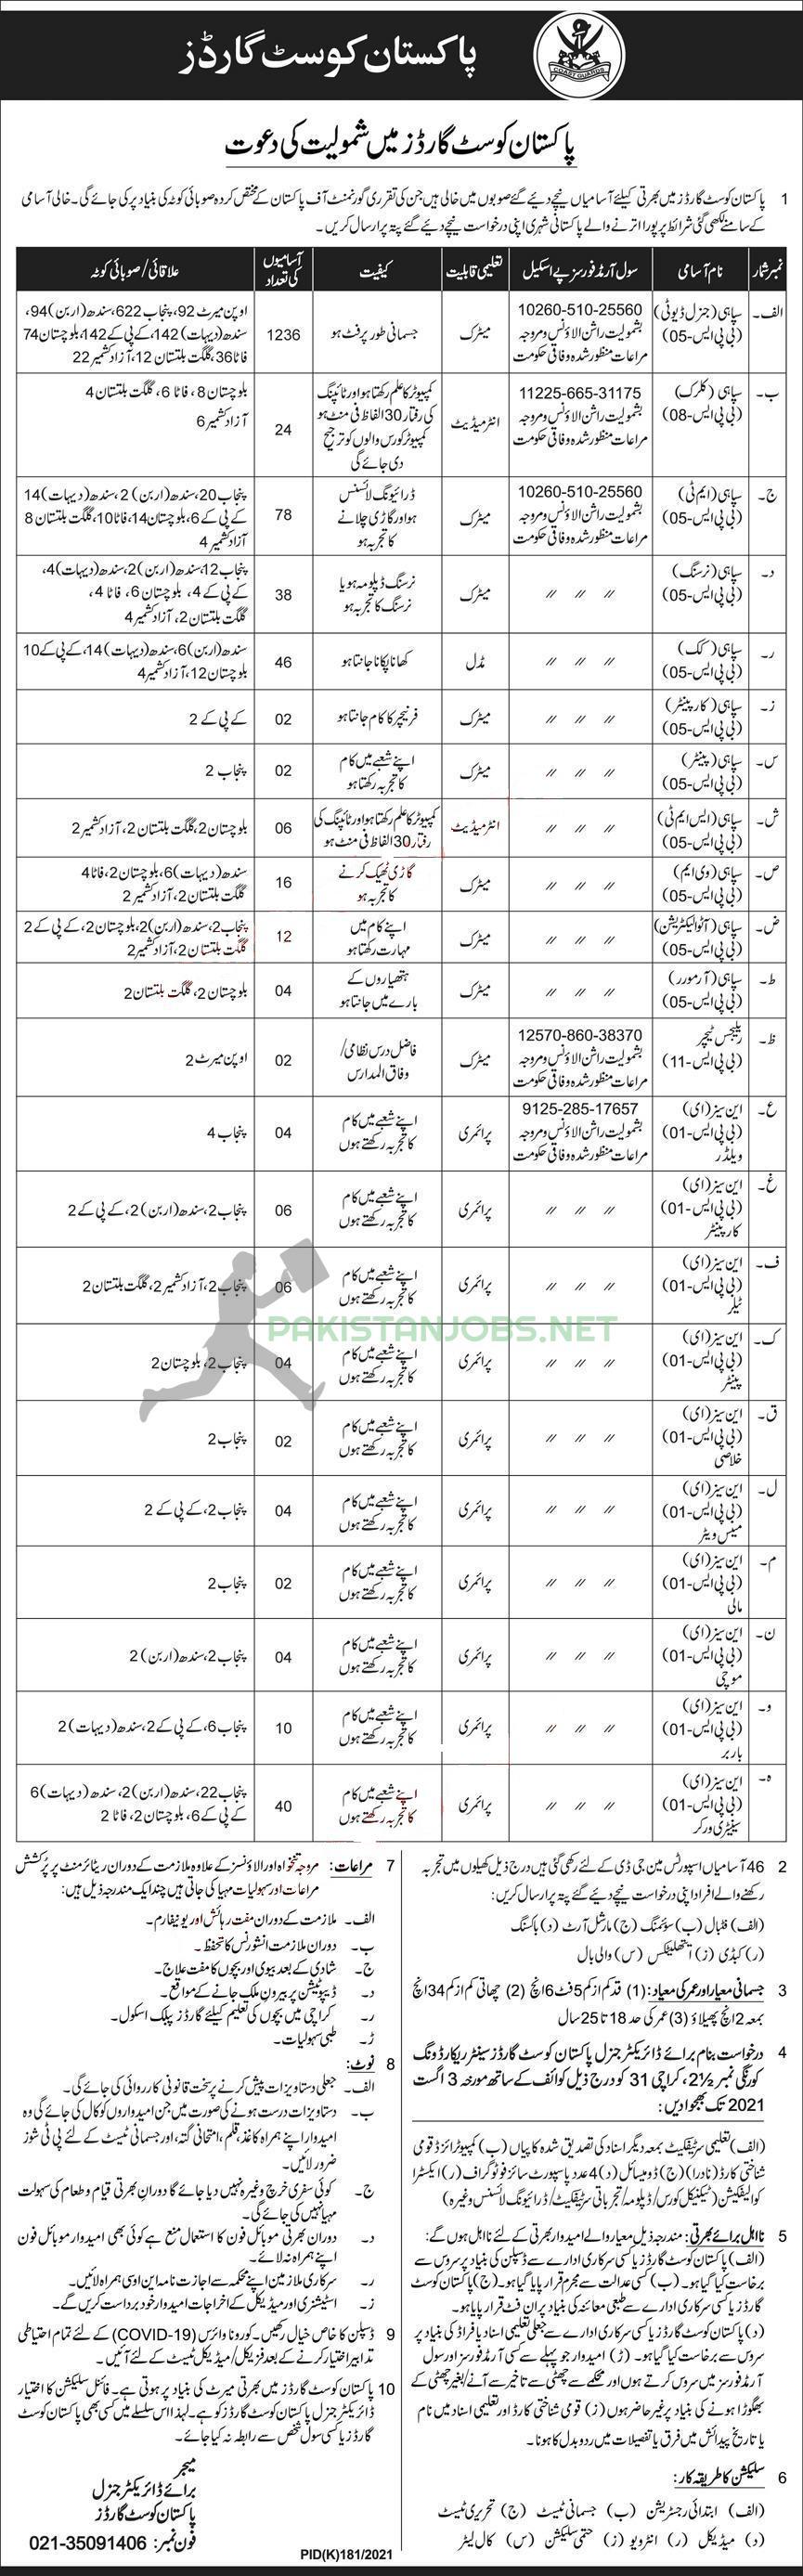 Pakistan Coast Guard Jobs 2021 Latest